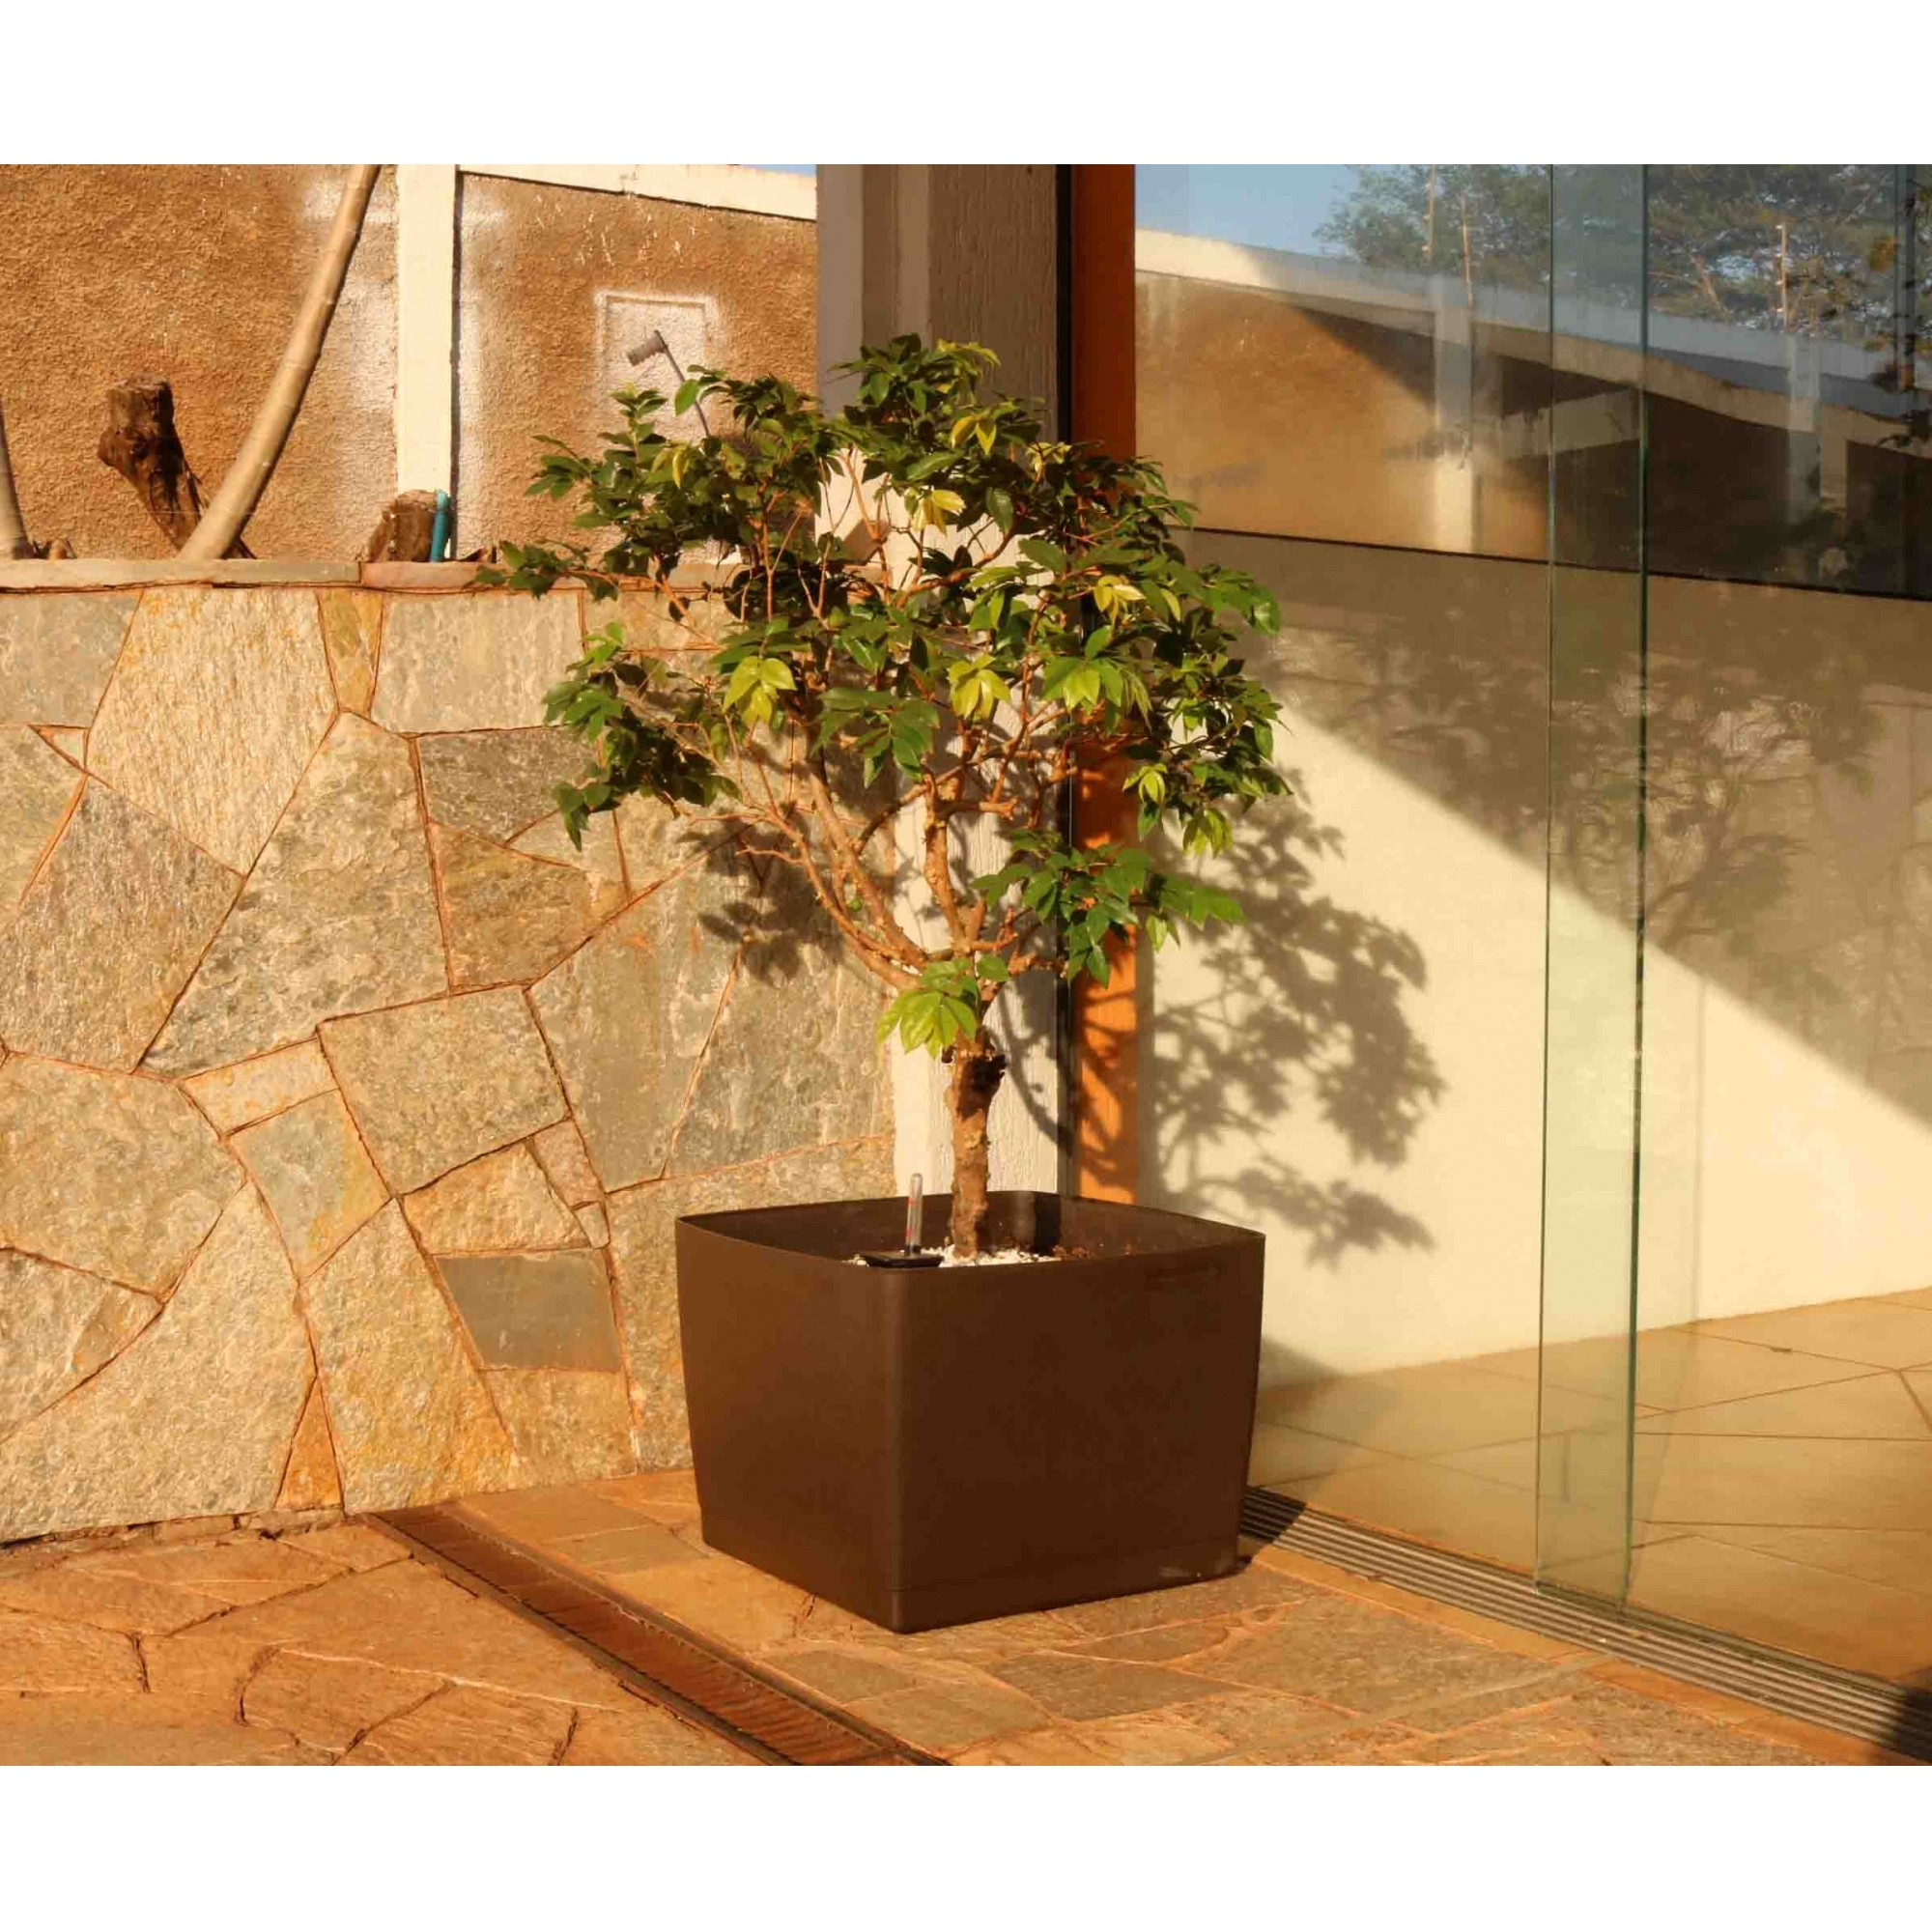 Vaso Autoirrigável Acqua Planta Quadrado Laranja 49cm x 49cm